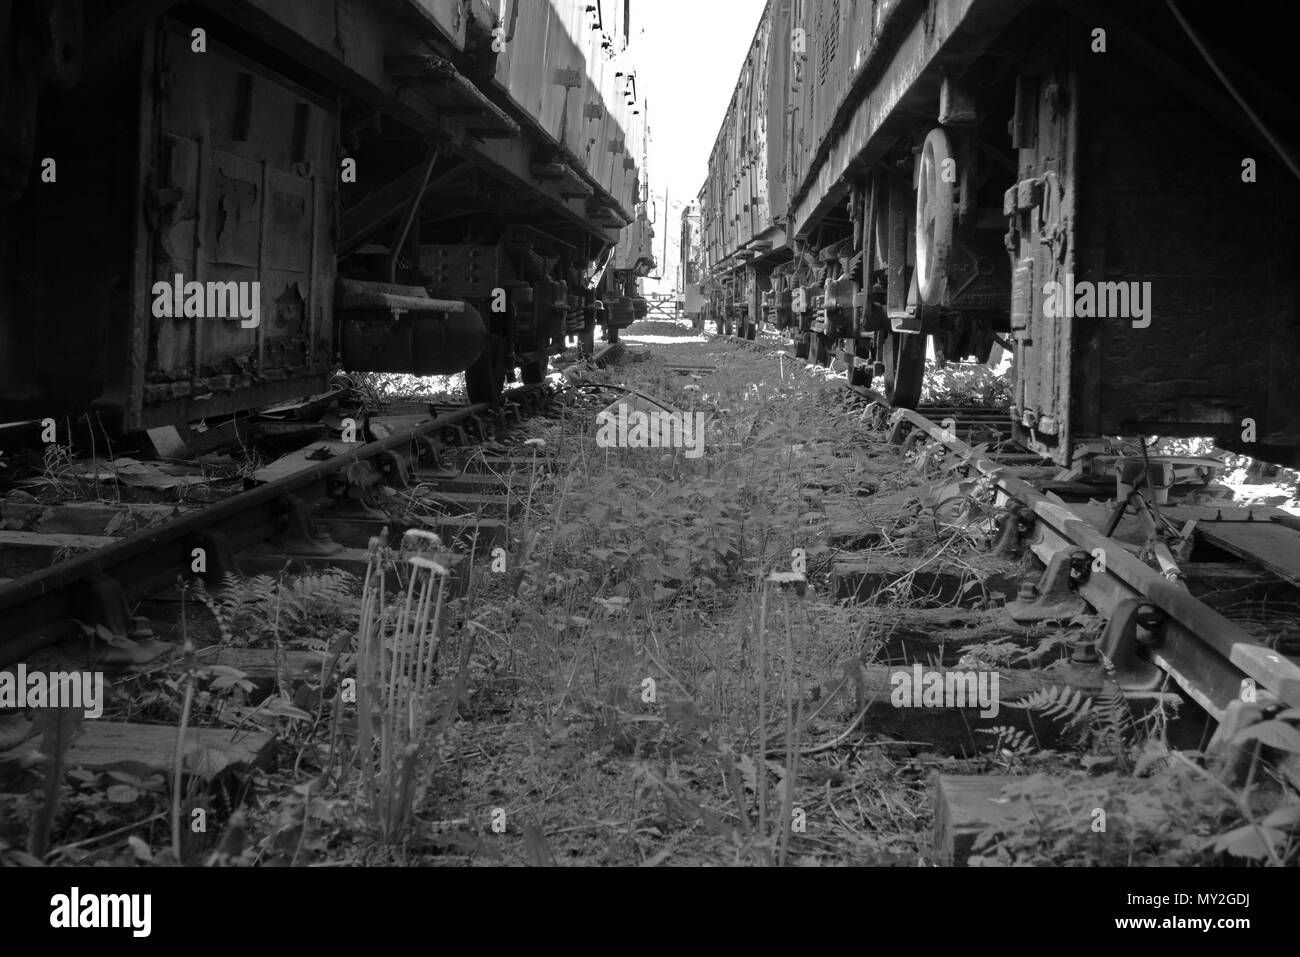 Transport Rail Wagon Imágenes De Stock & Transport Rail Wagon Fotos ...